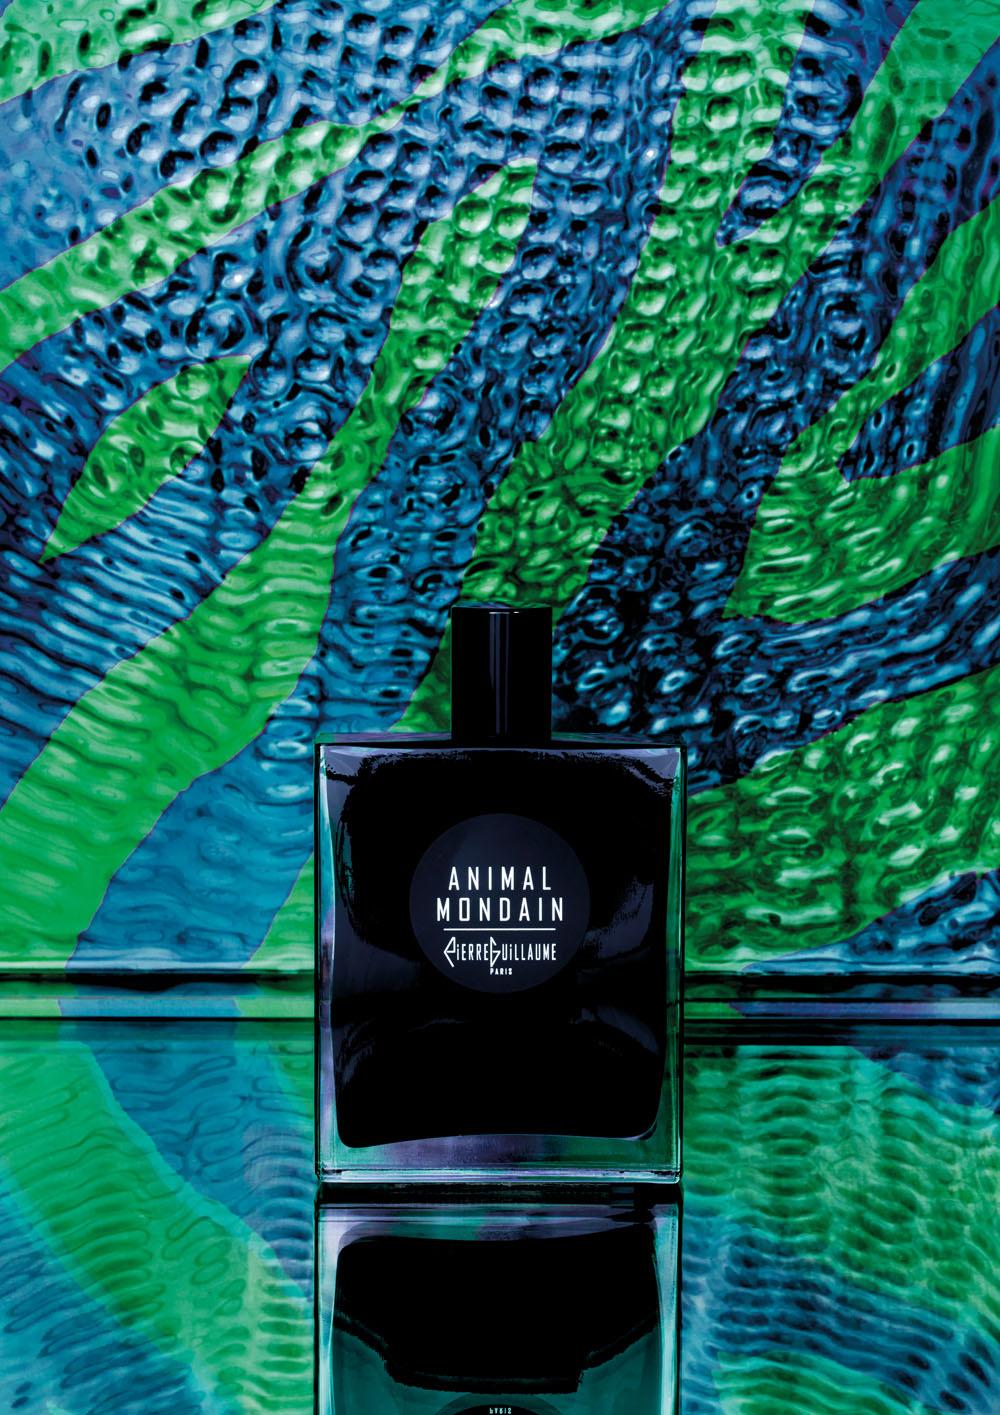 animal mondain parfum